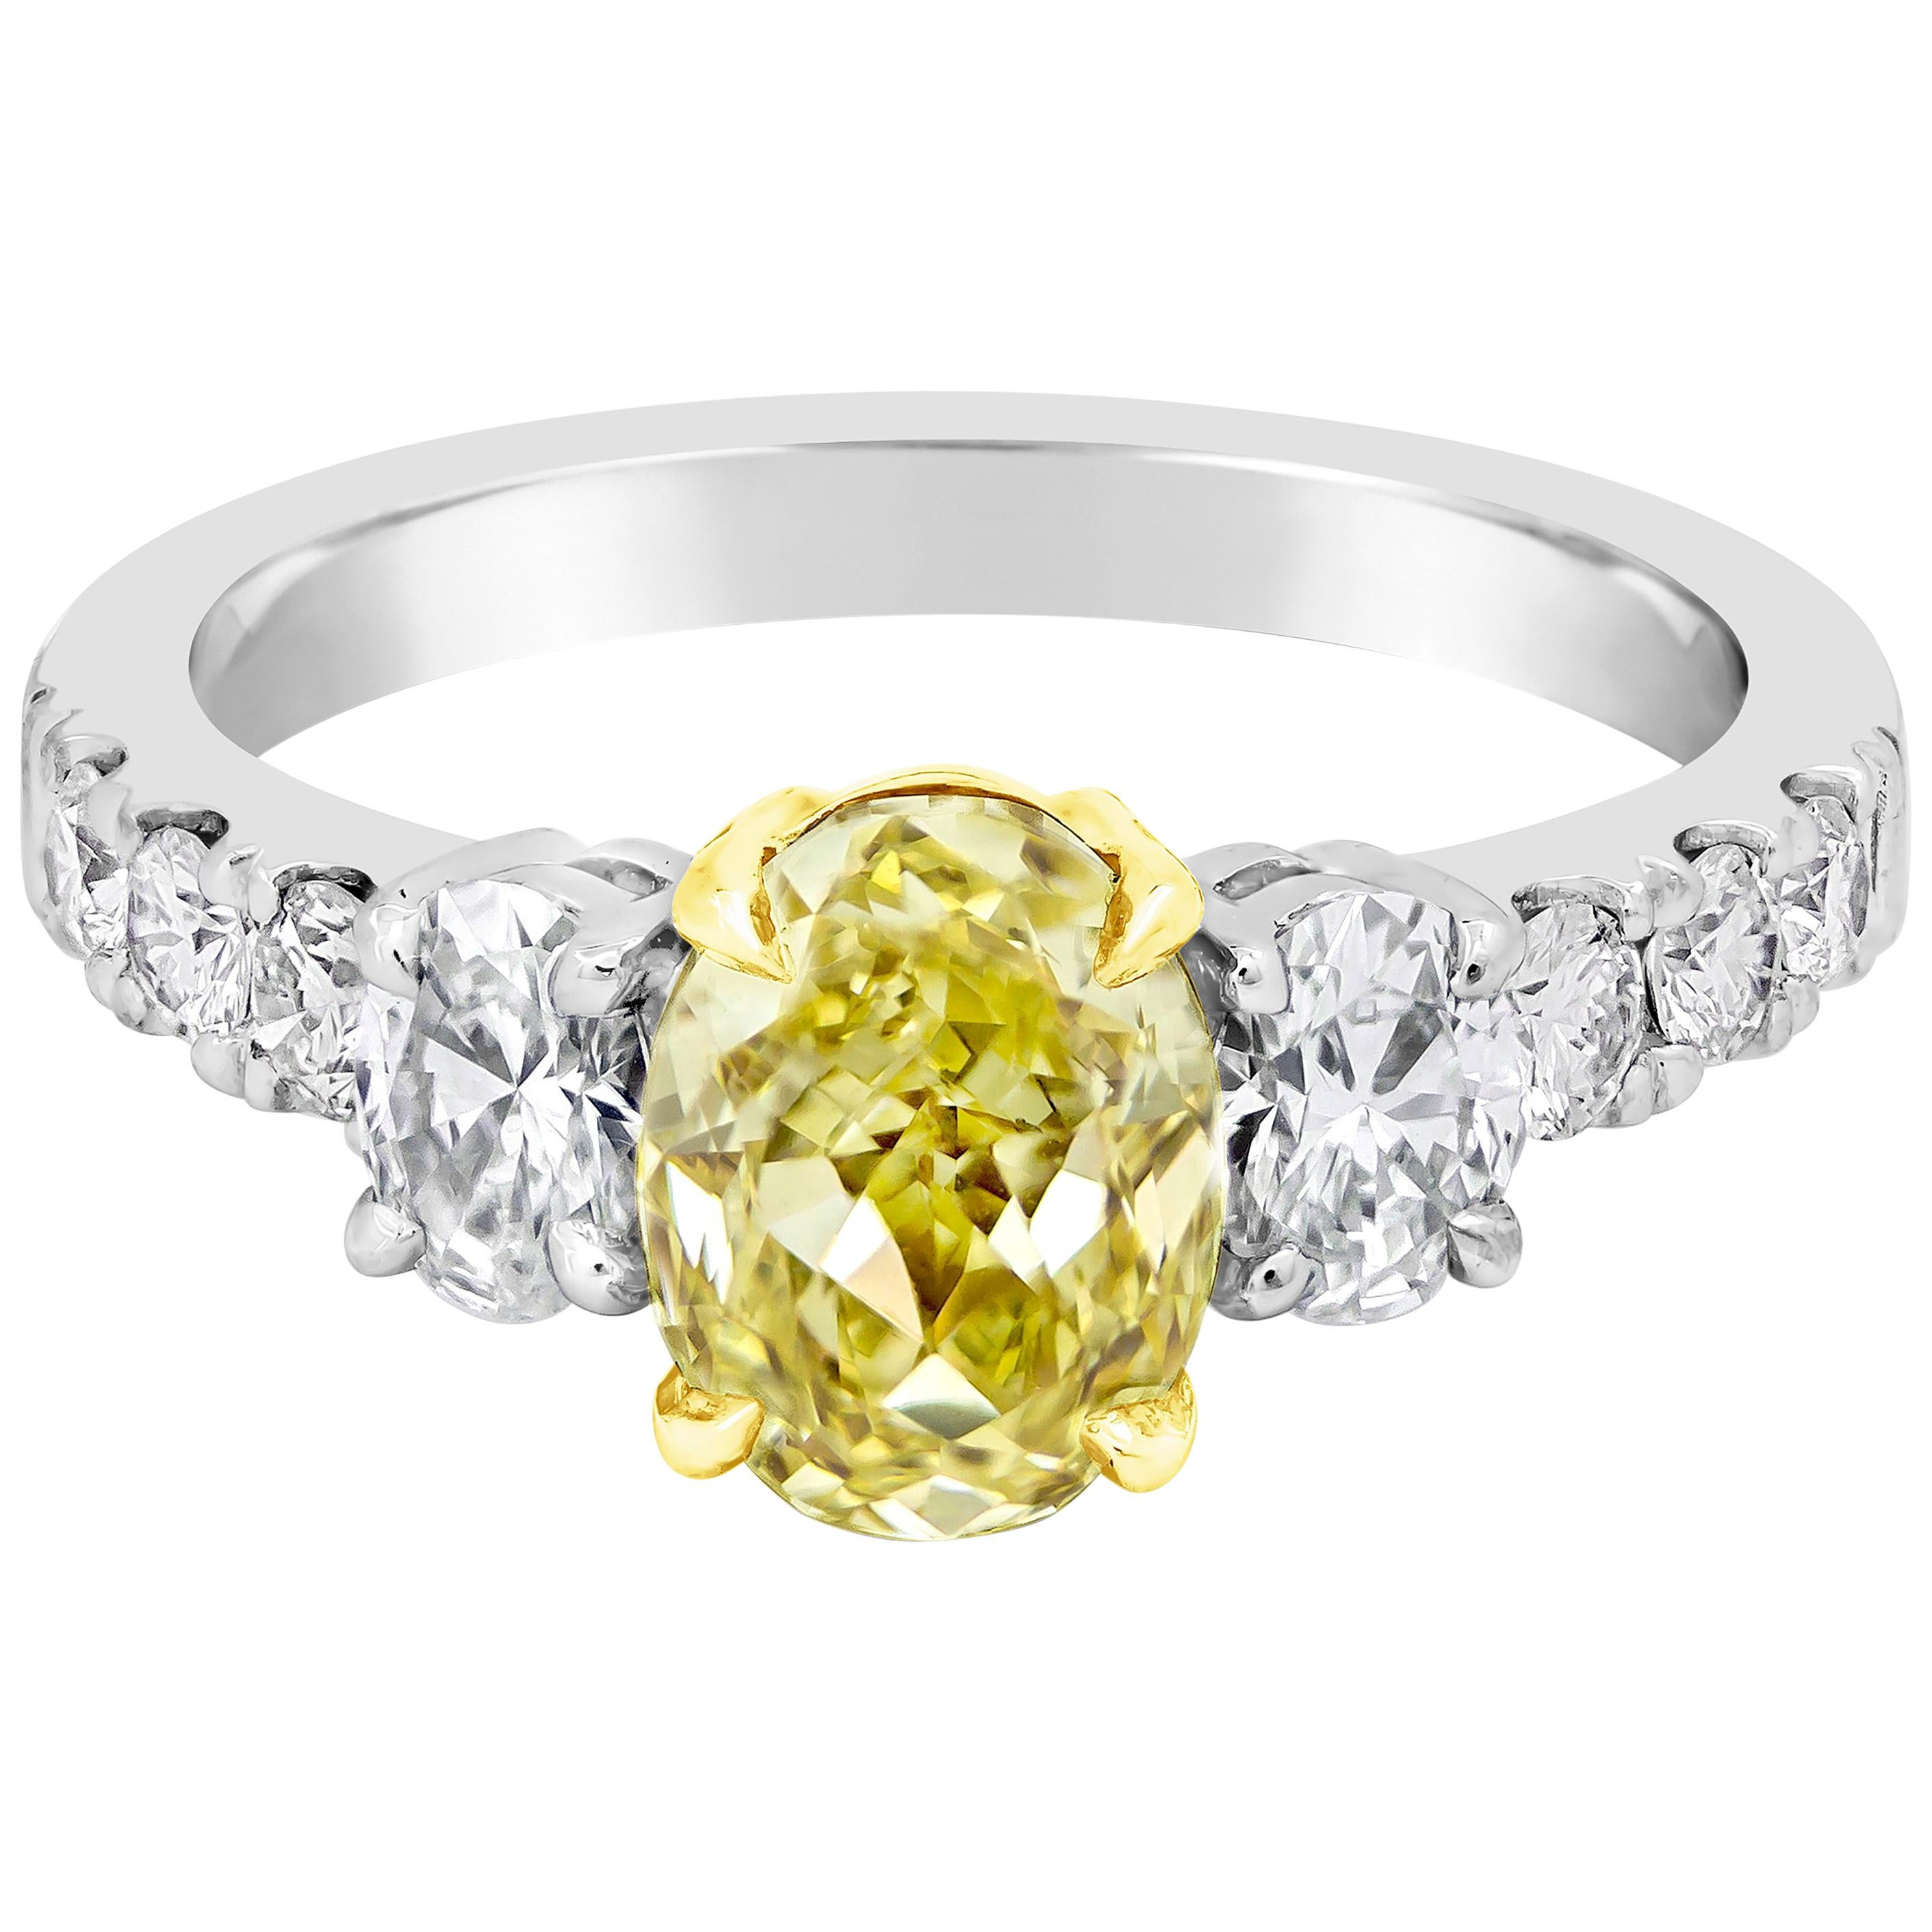 Roman Malakov GIA Certified Oval Cut Yellow Diamond Three-Stone Engagement Ring